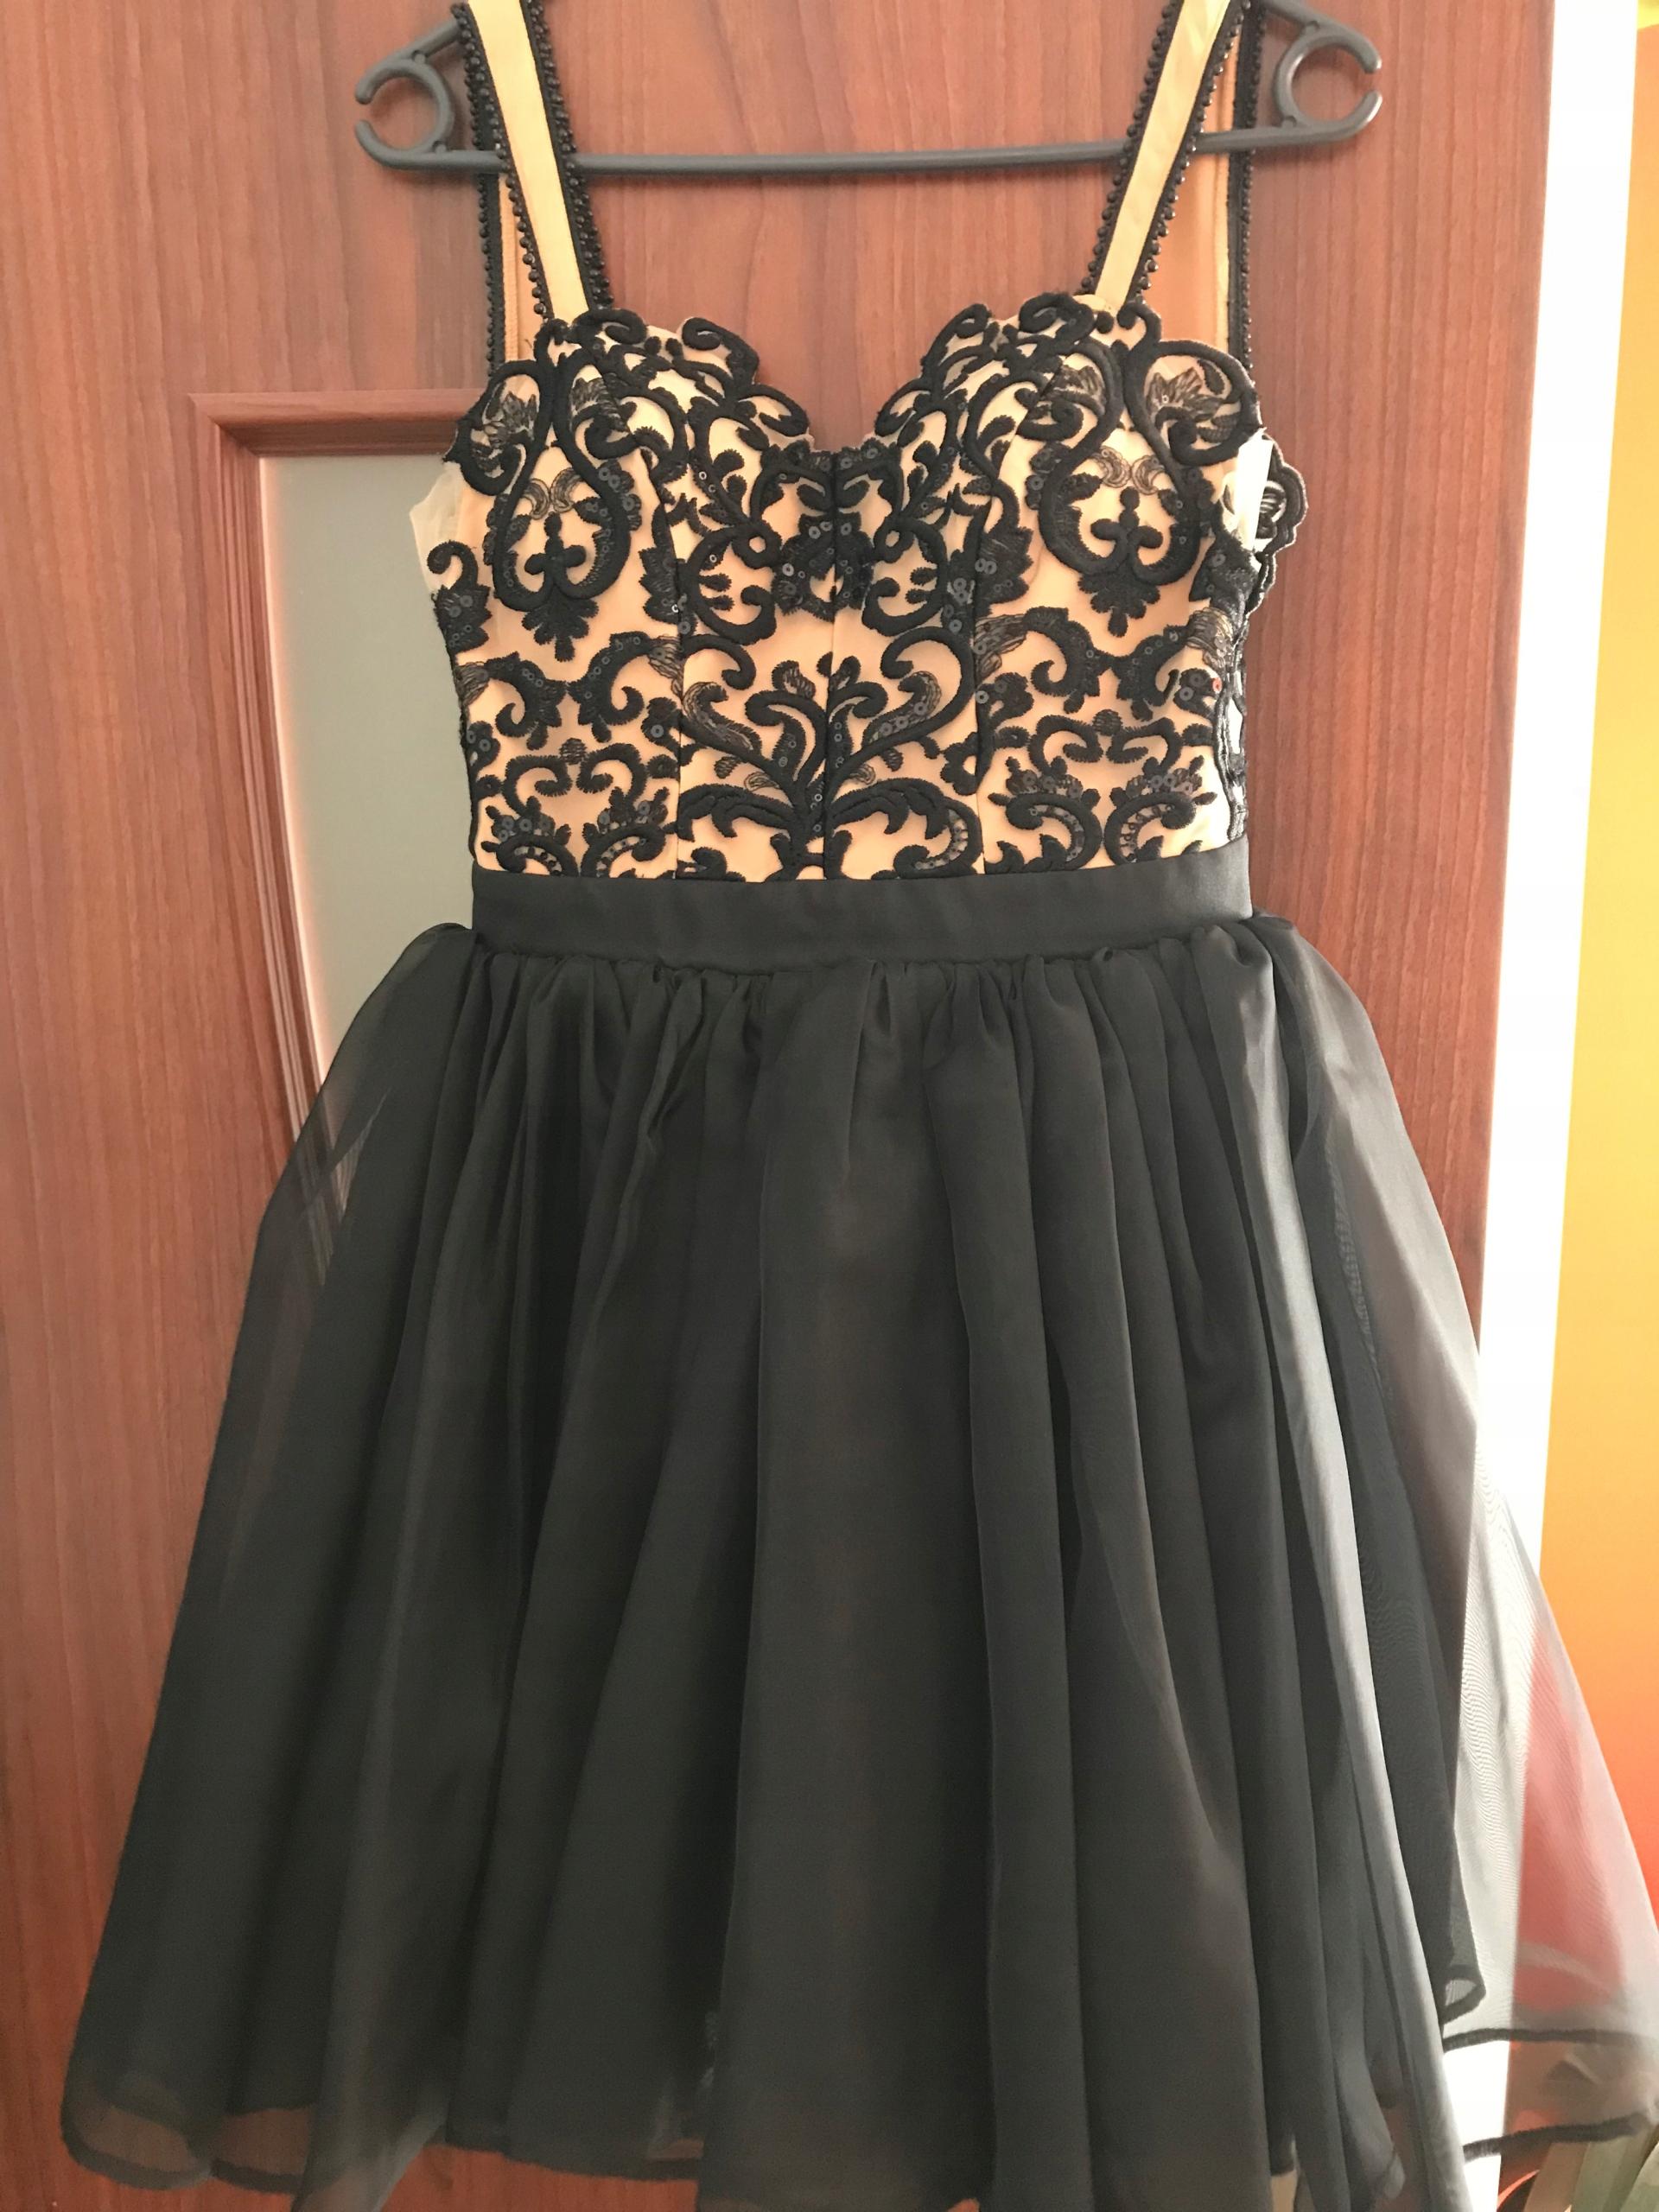 372ce954f4 Sukienka Lou Karen rozmiar S - 7489539433 - oficjalne archiwum allegro